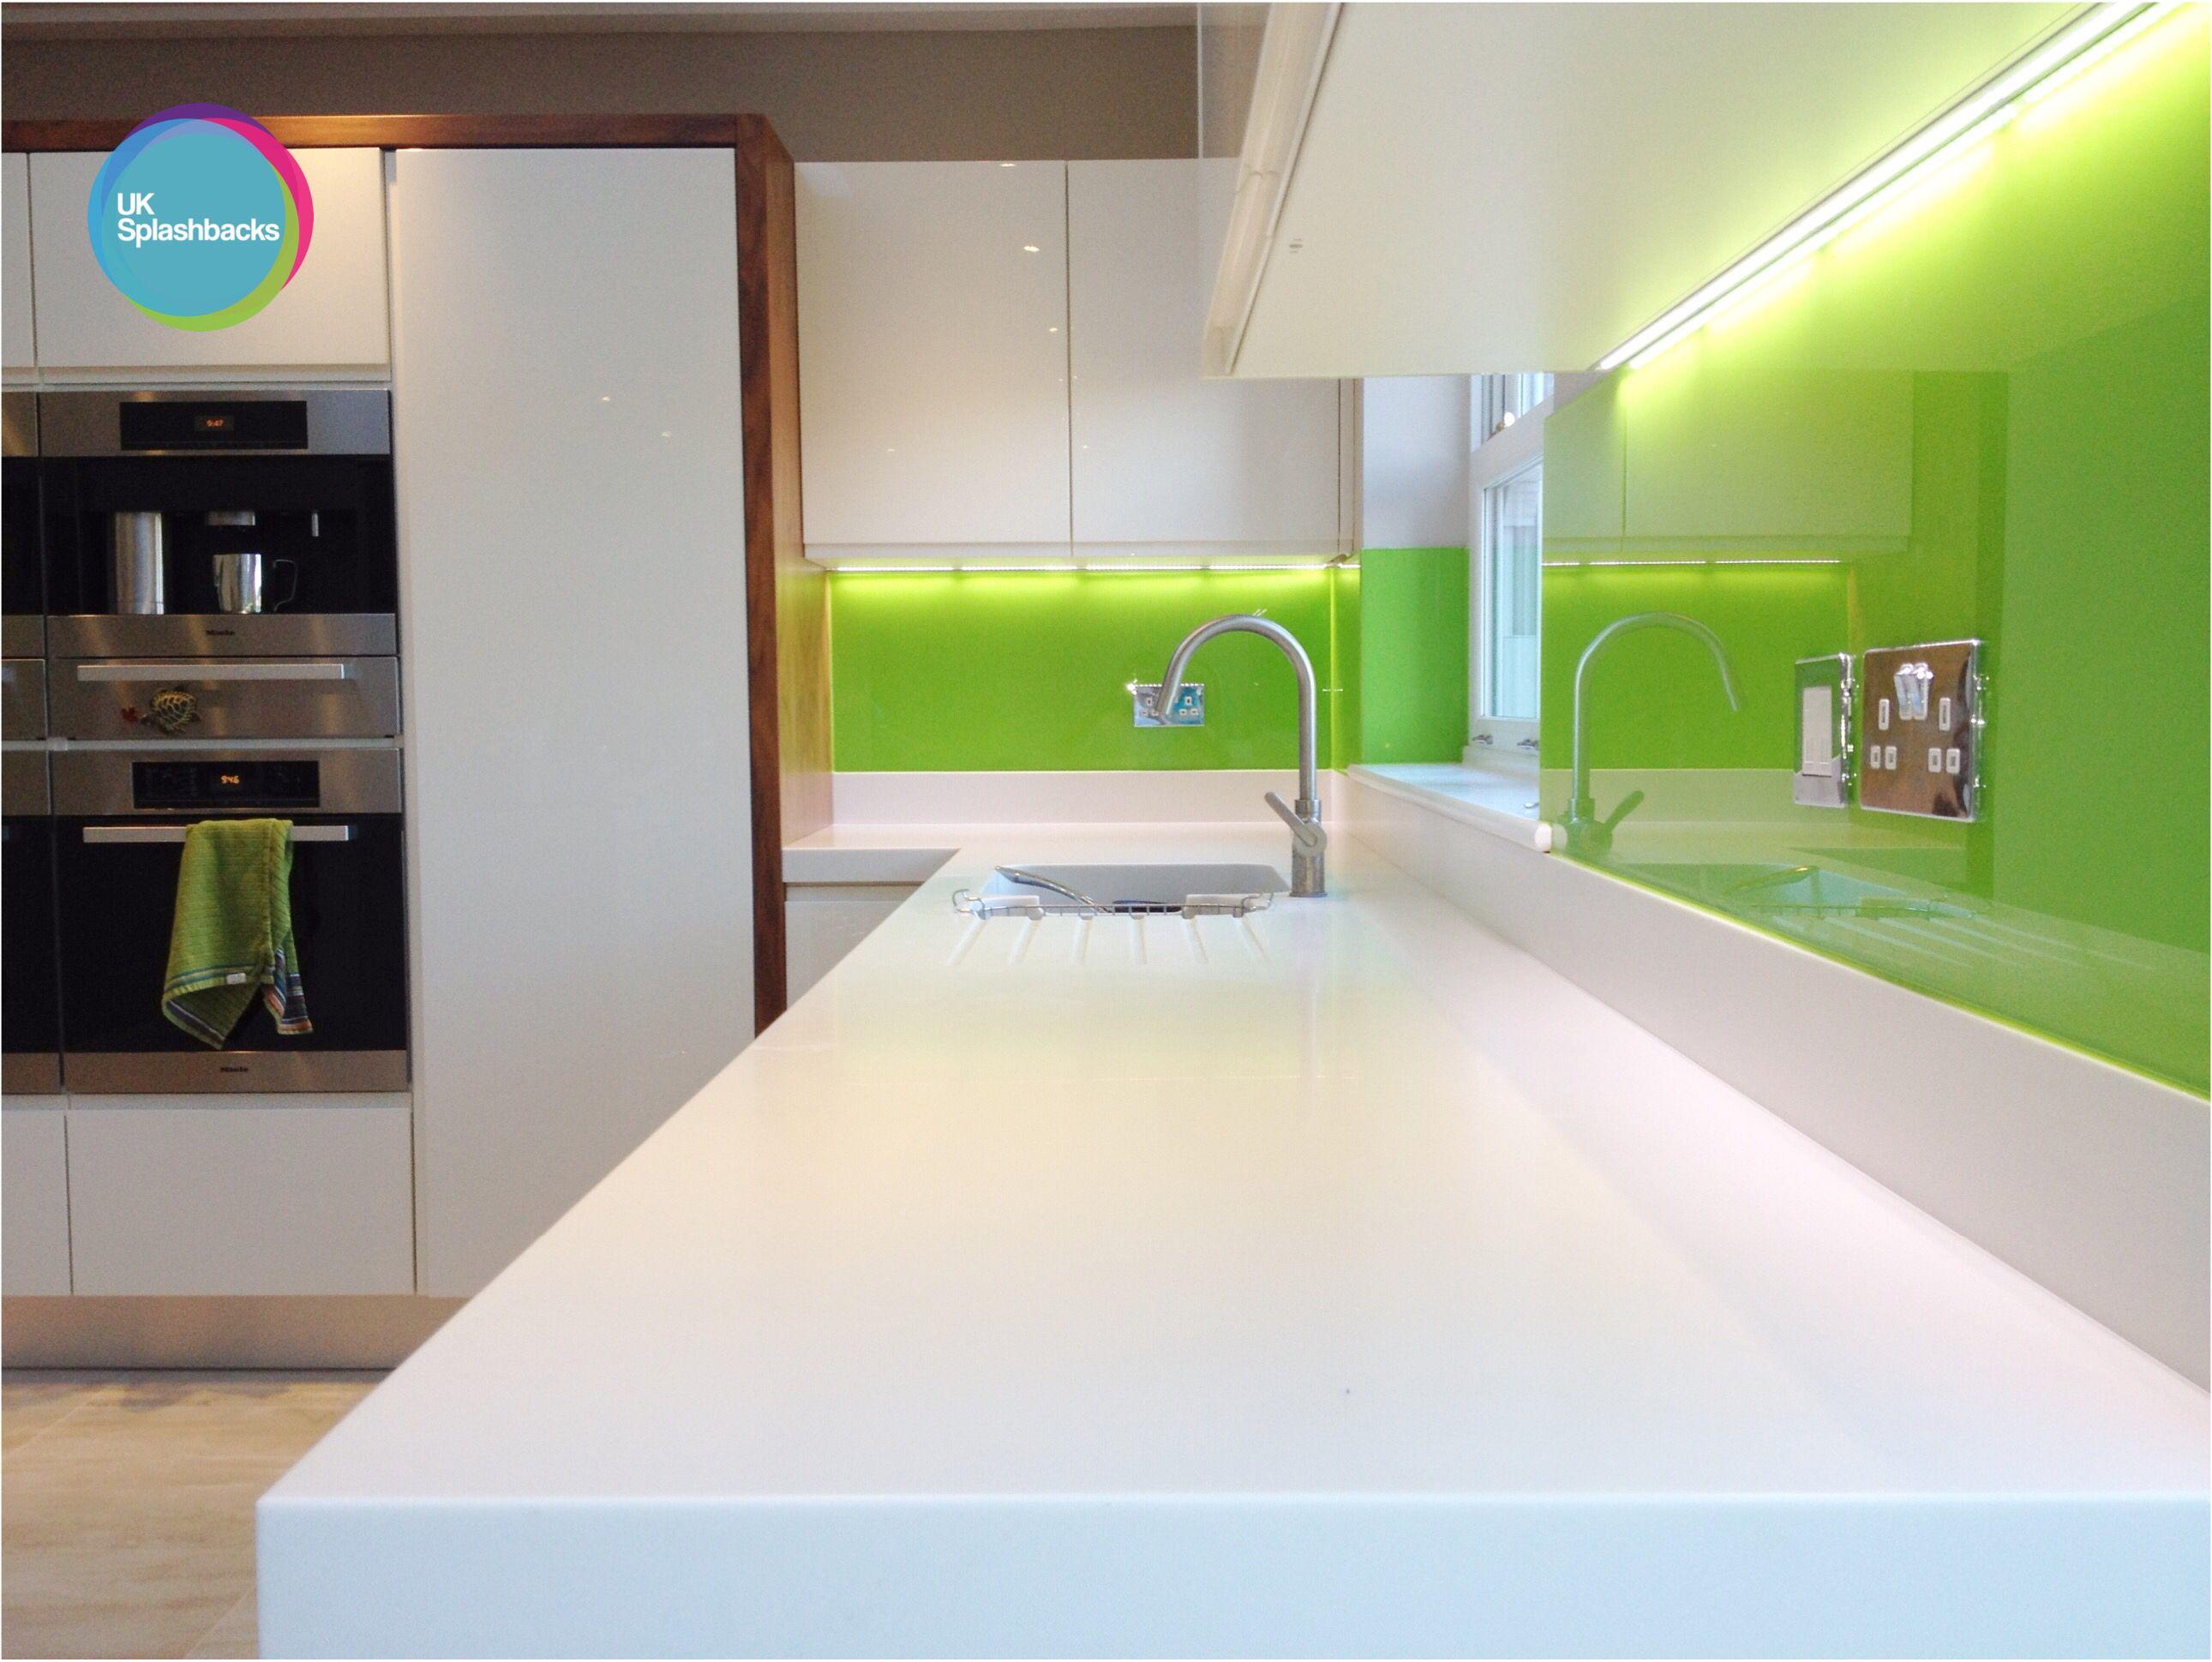 Green glass Splashbacks Glass splashback, Lime green